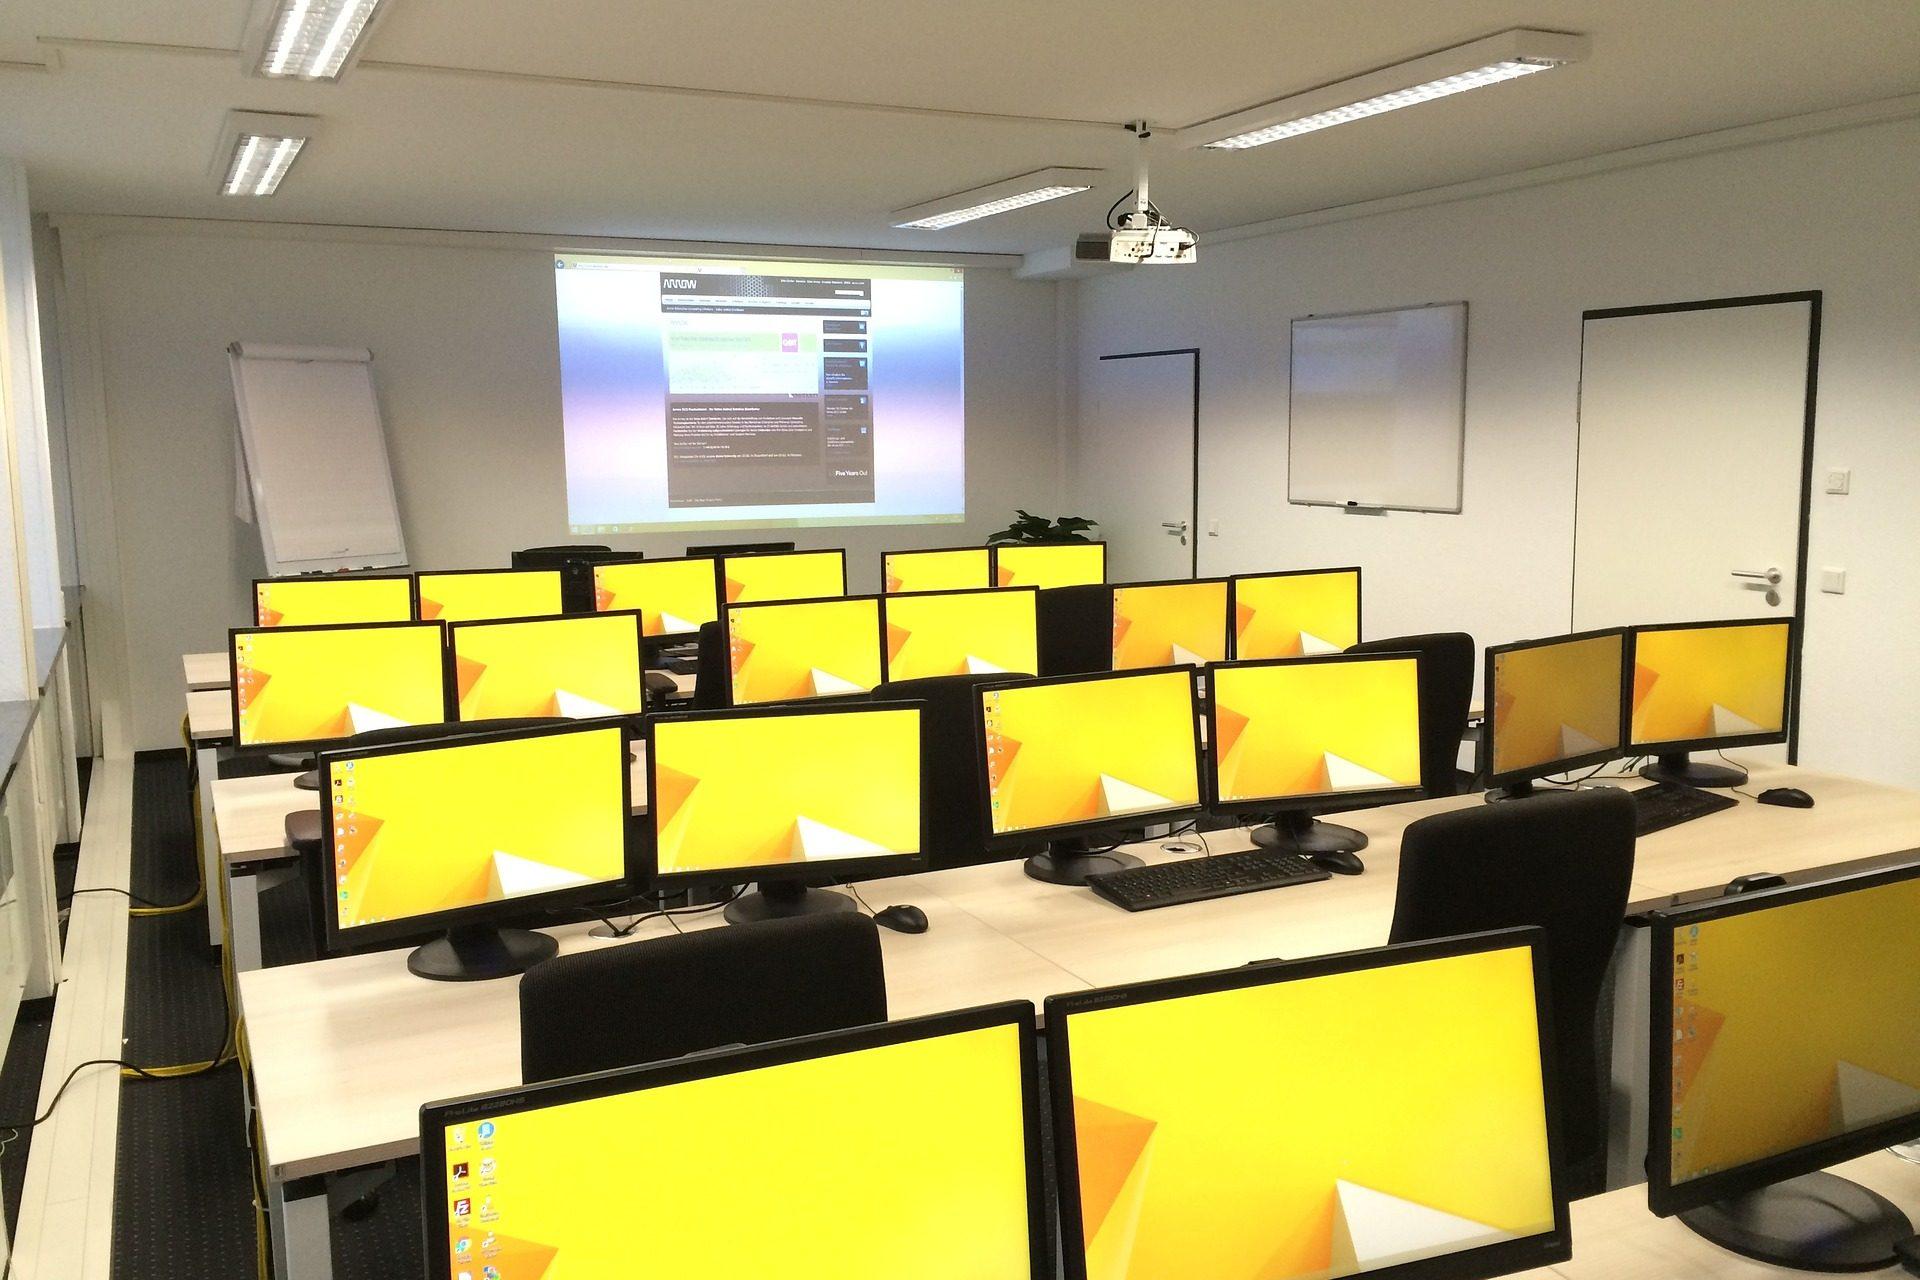 classroom-1167524_1920